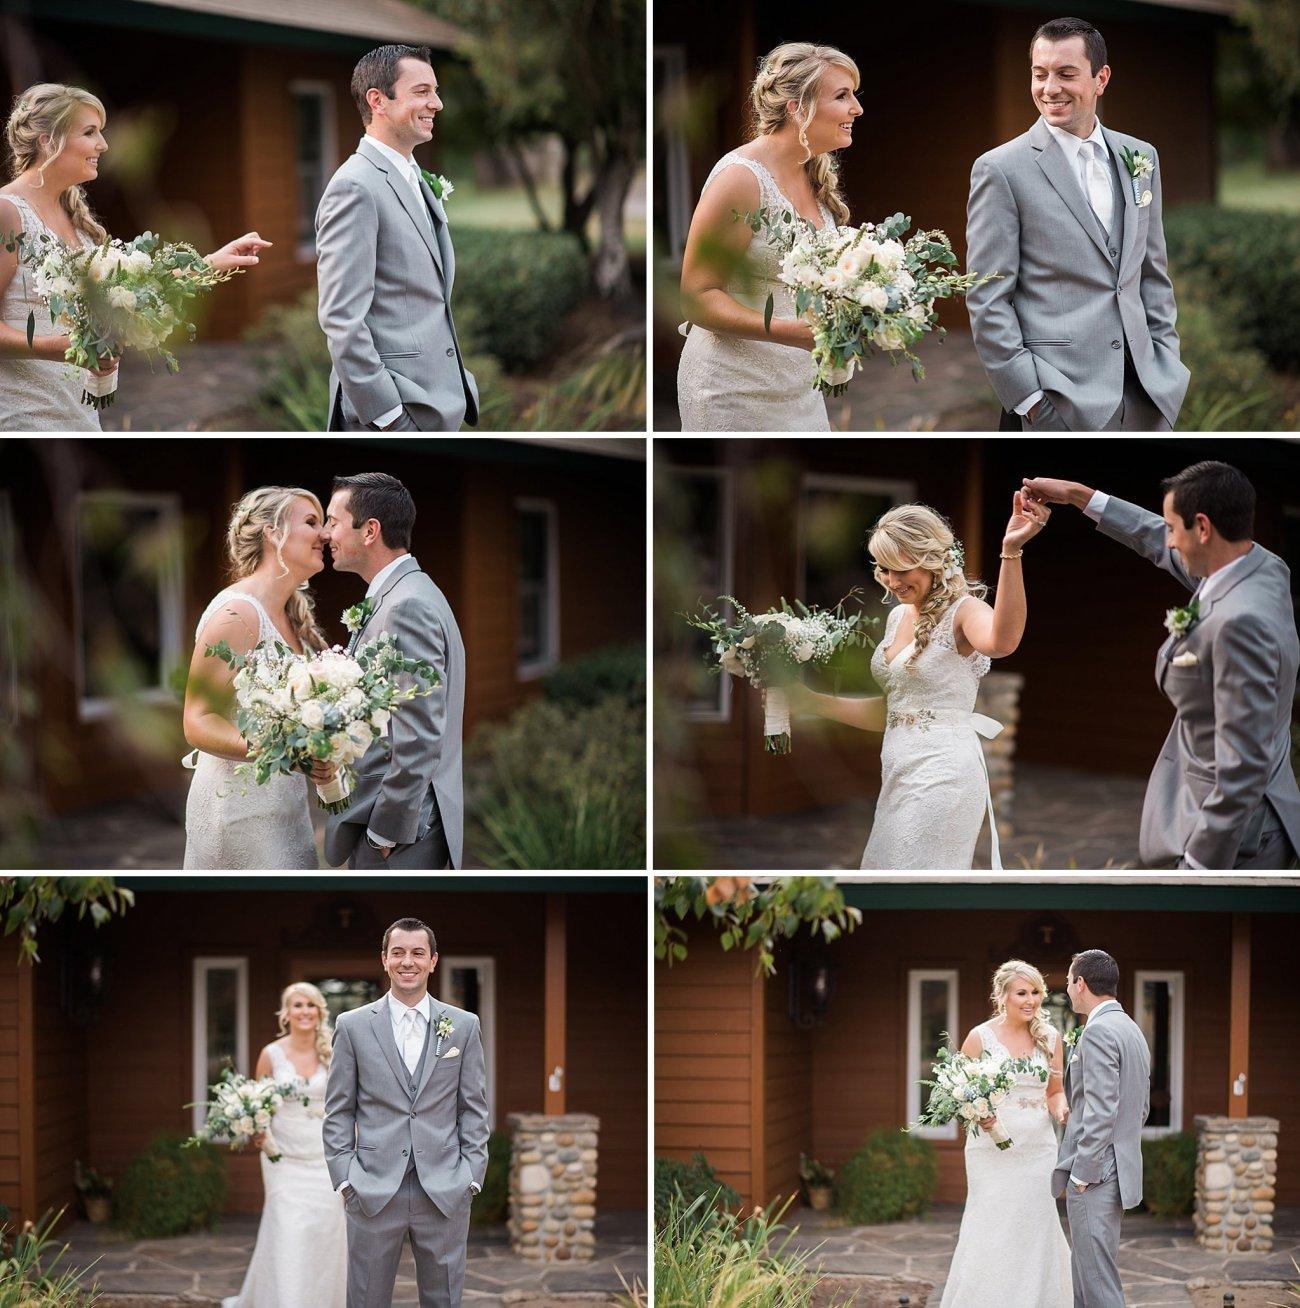 Erin + Marcel Third Element Photography & Cinema Fresno County Estate Wedding Hybrid Film Wedding Photographer_0021